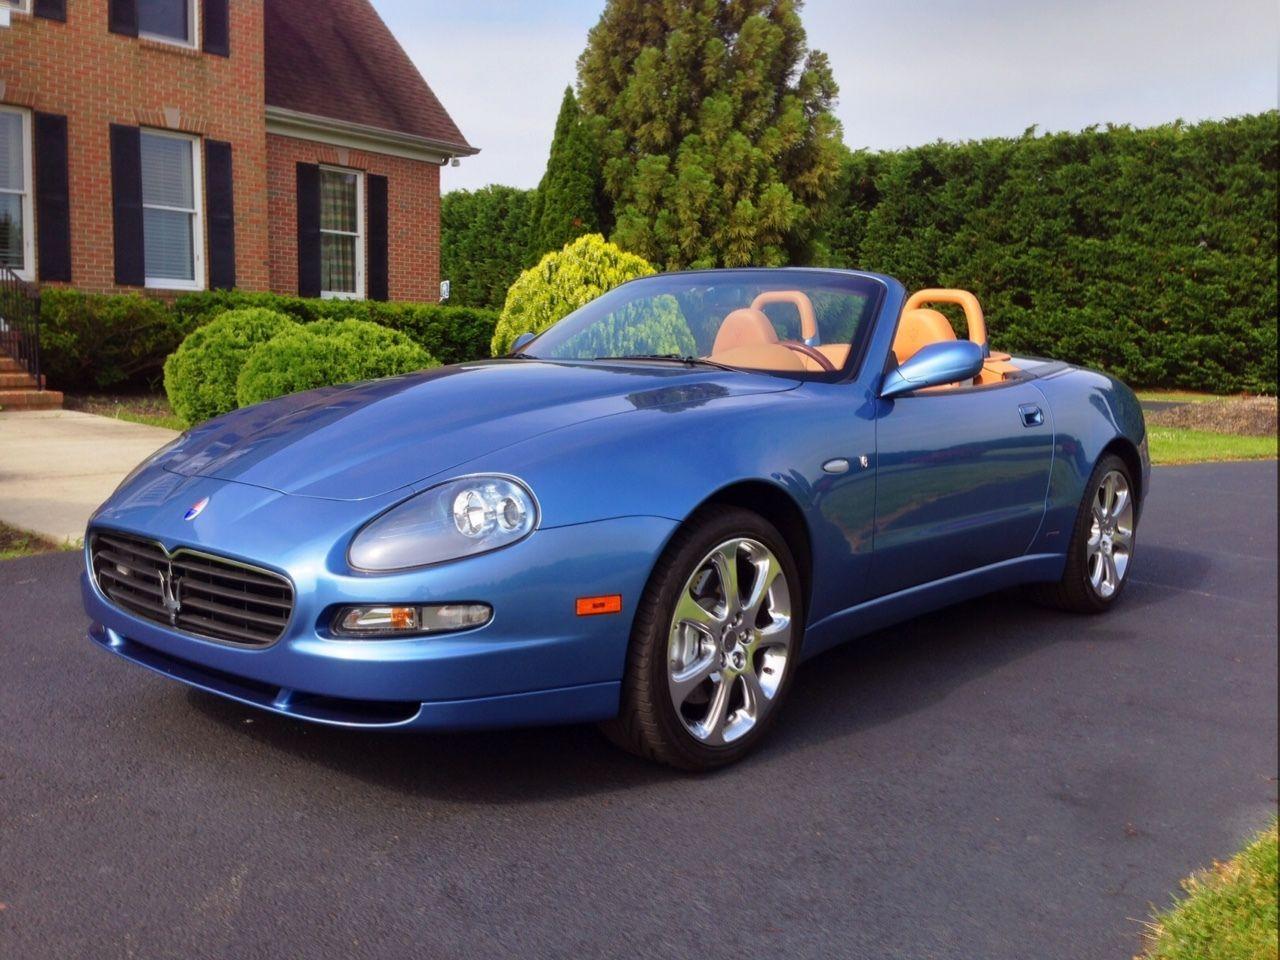 2005 Maserati Spyder | Italian cars for sale | Pinterest | Maserati ...